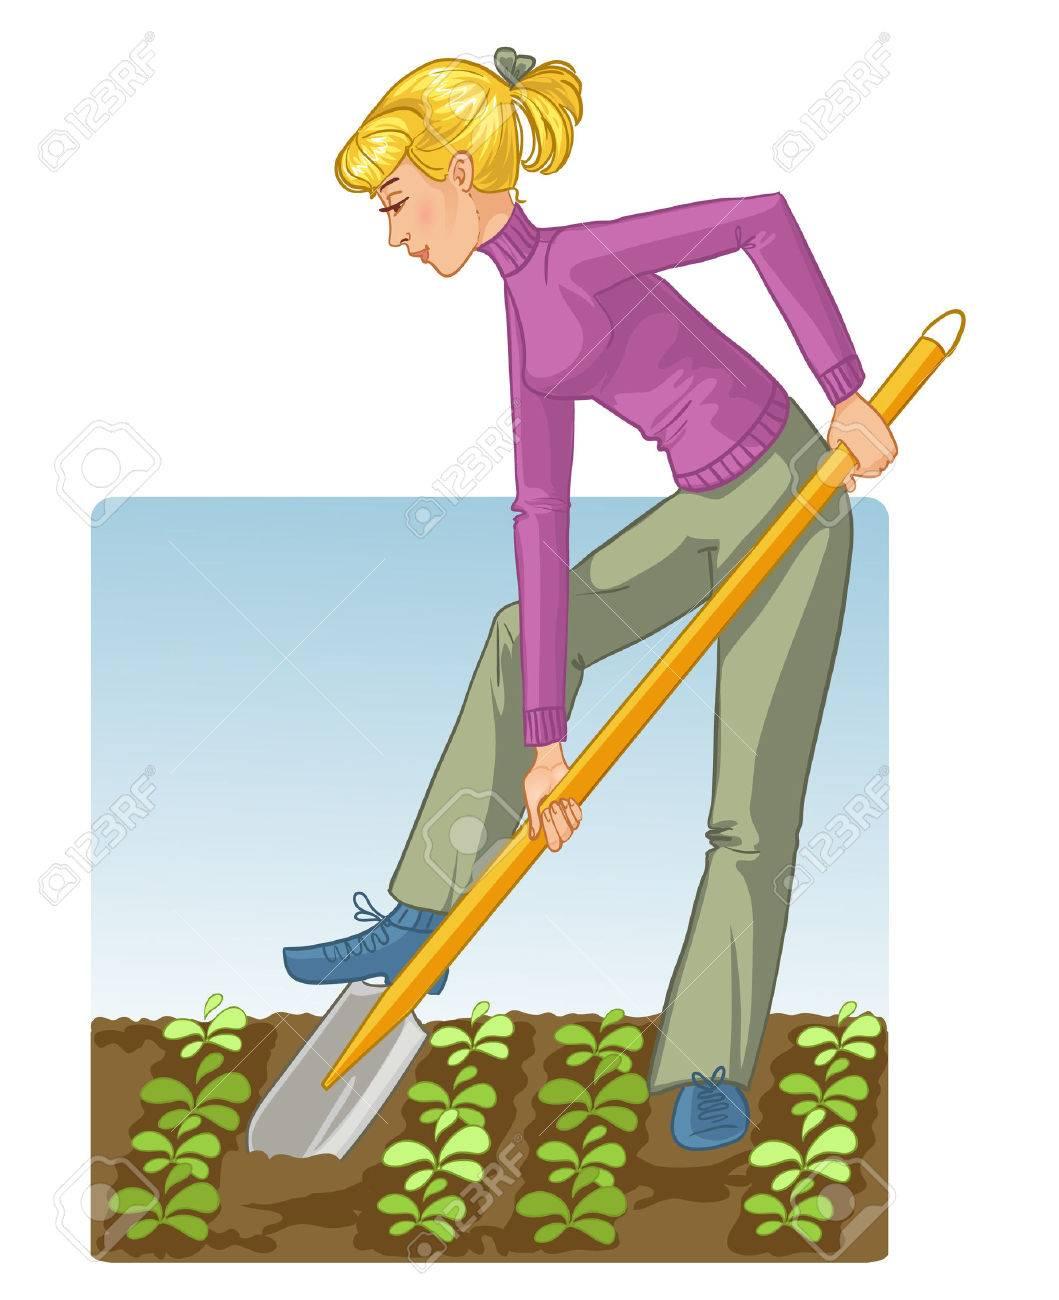 669 seasonal work in the garden stock illustrations cliparts and seasonal work in the garden young blonde w digging spring soil shovel